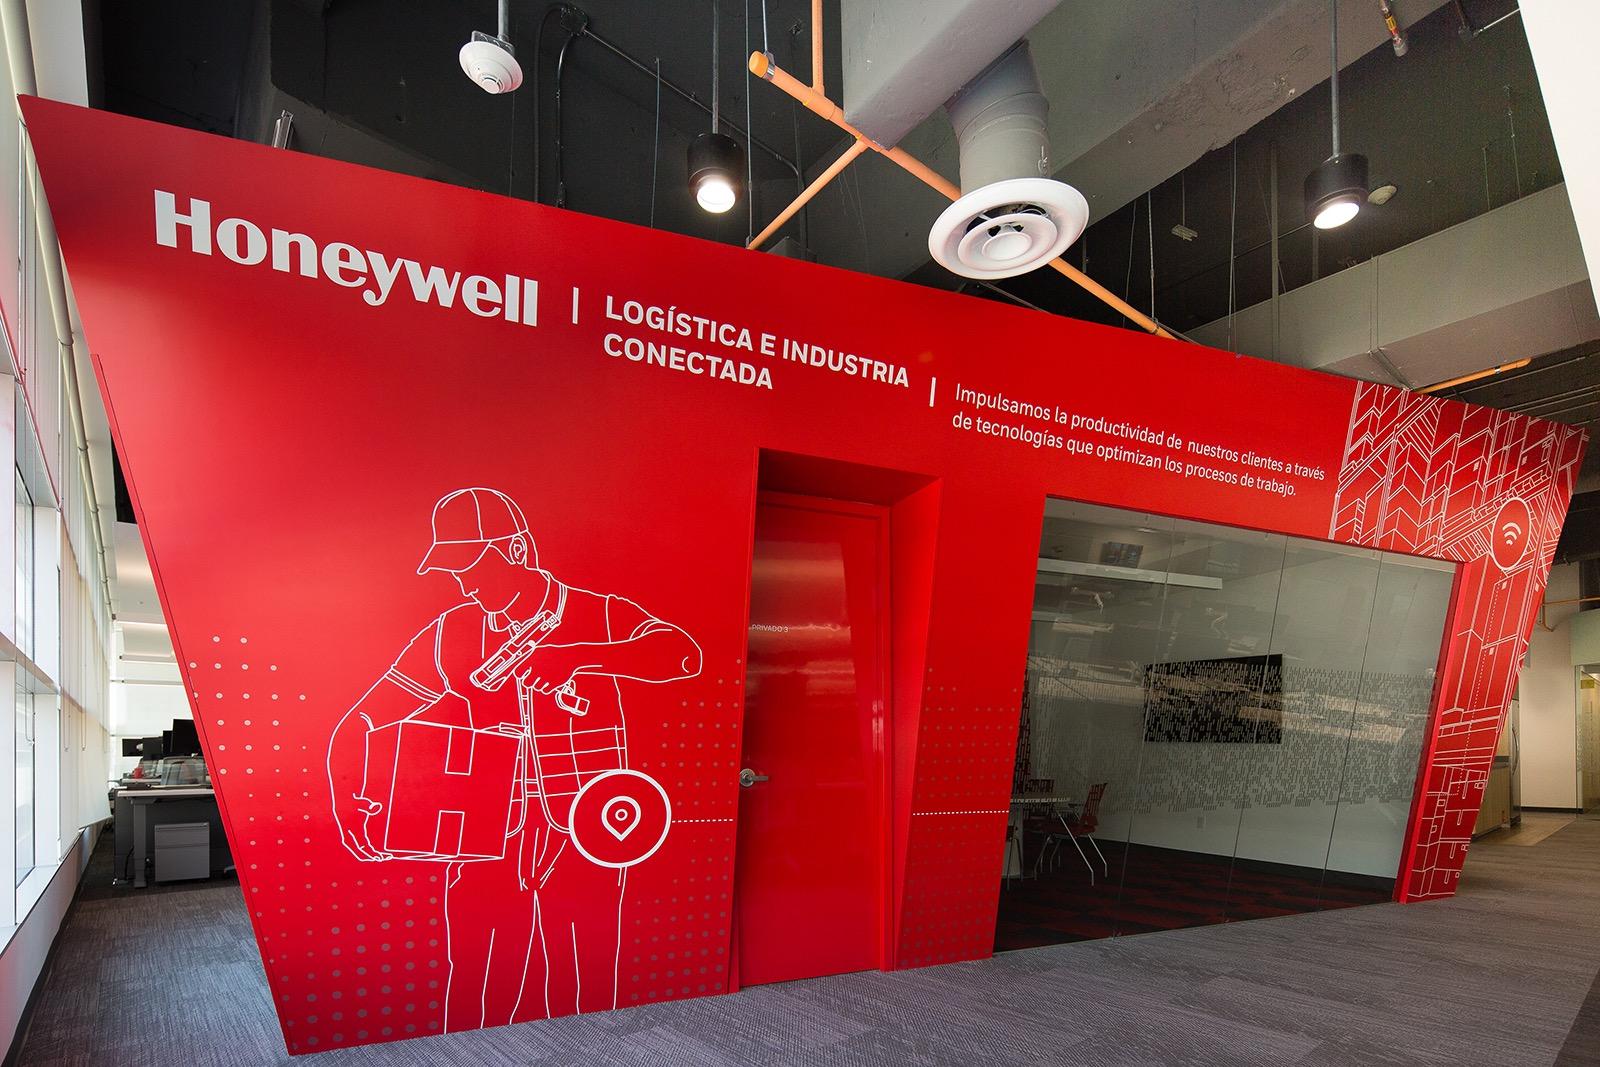 honeywell-technology-solutions-office-3